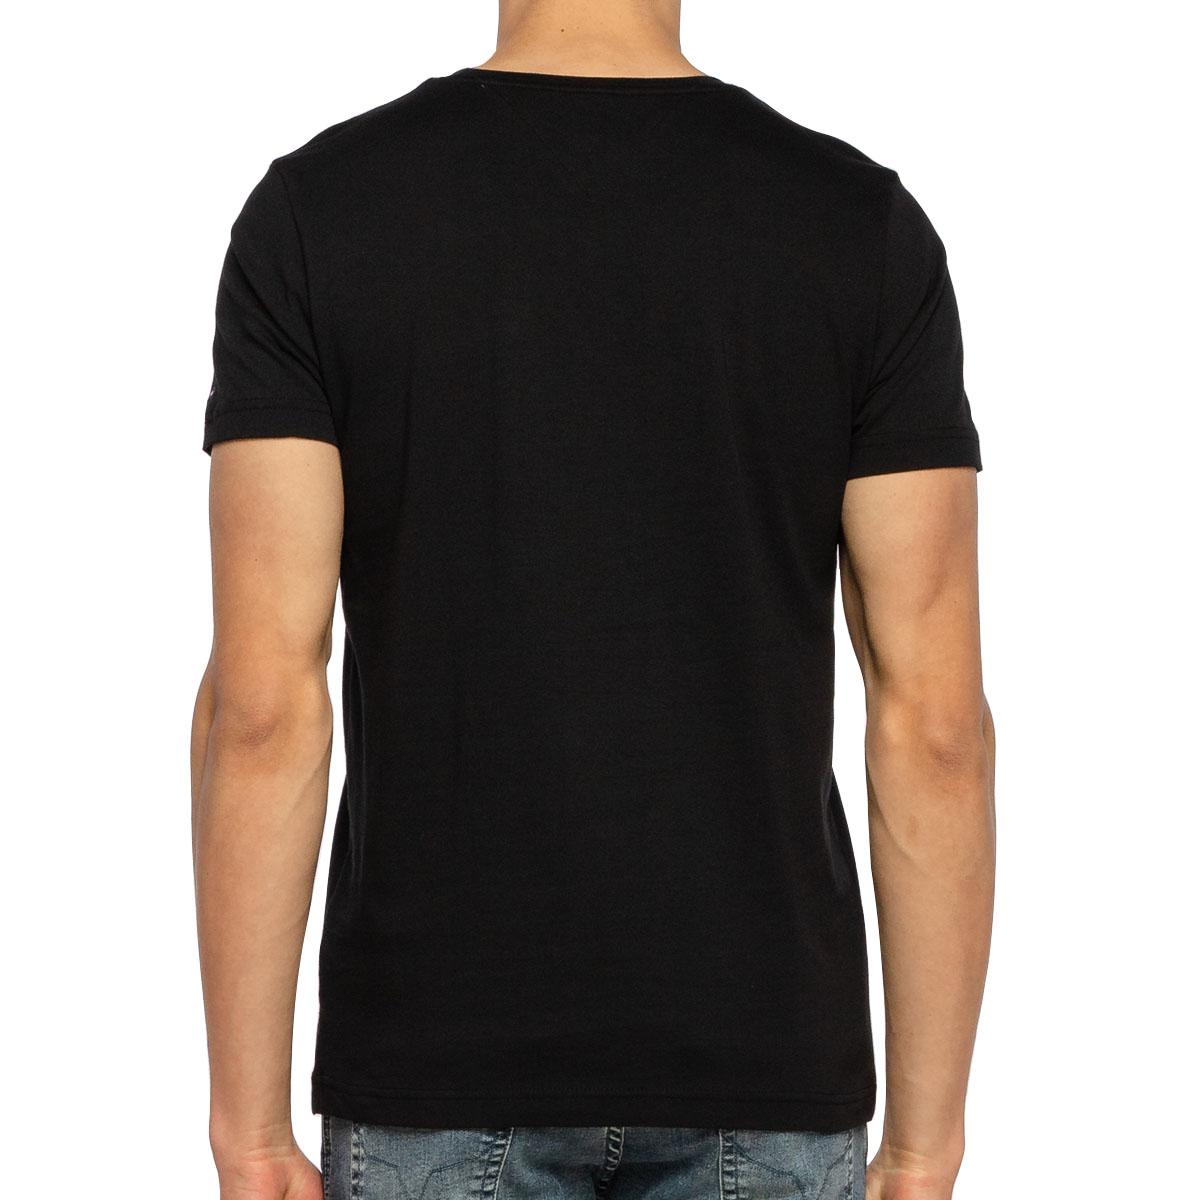 Camiseta Tommy Hilfiger logo Box Tee Preta